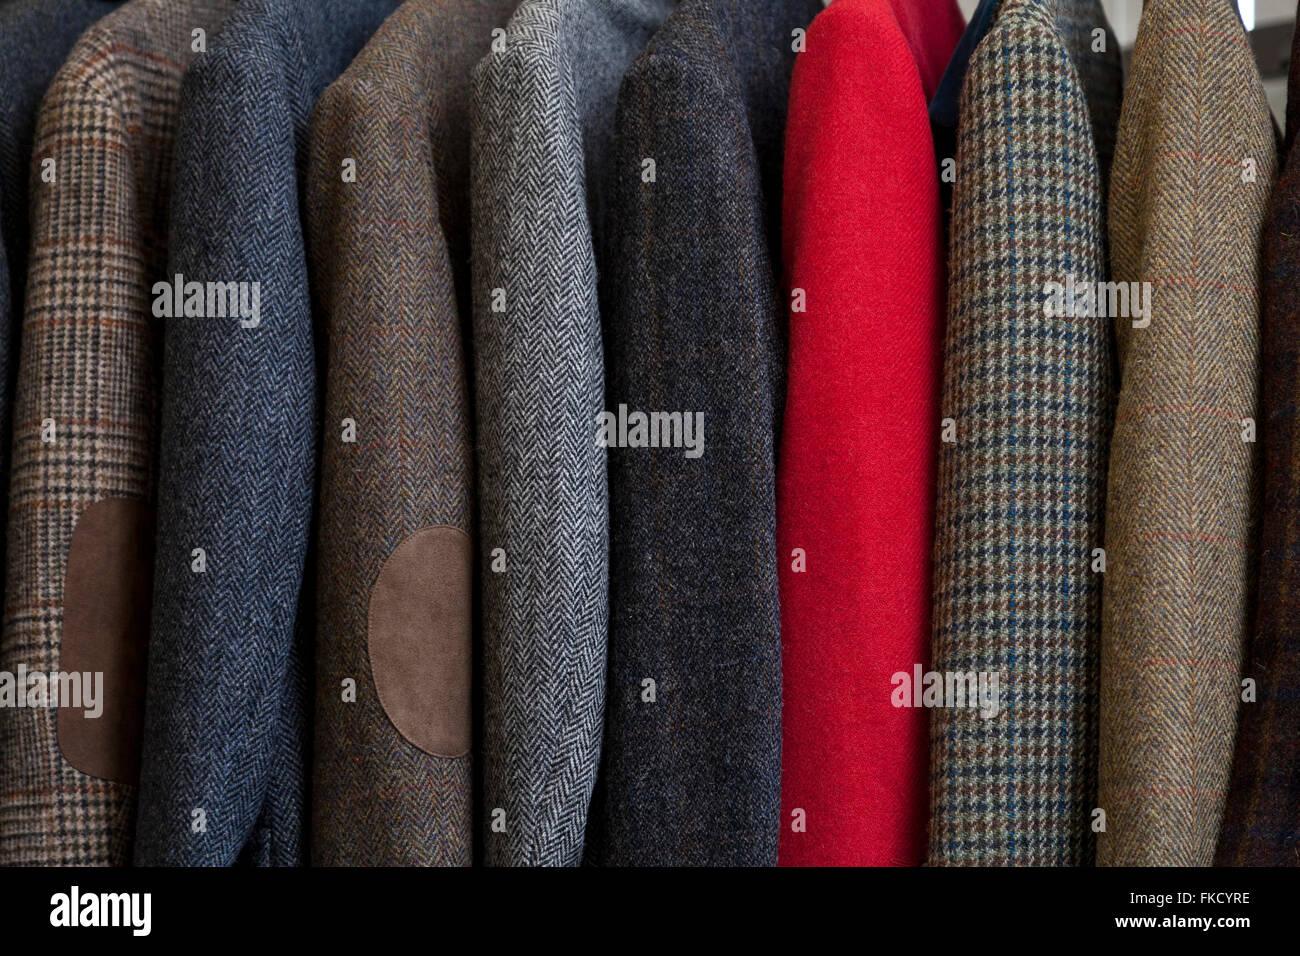 1b3ba88cc1b2 Harris Tweed Fashion Stock Photos   Harris Tweed Fashion Stock ...